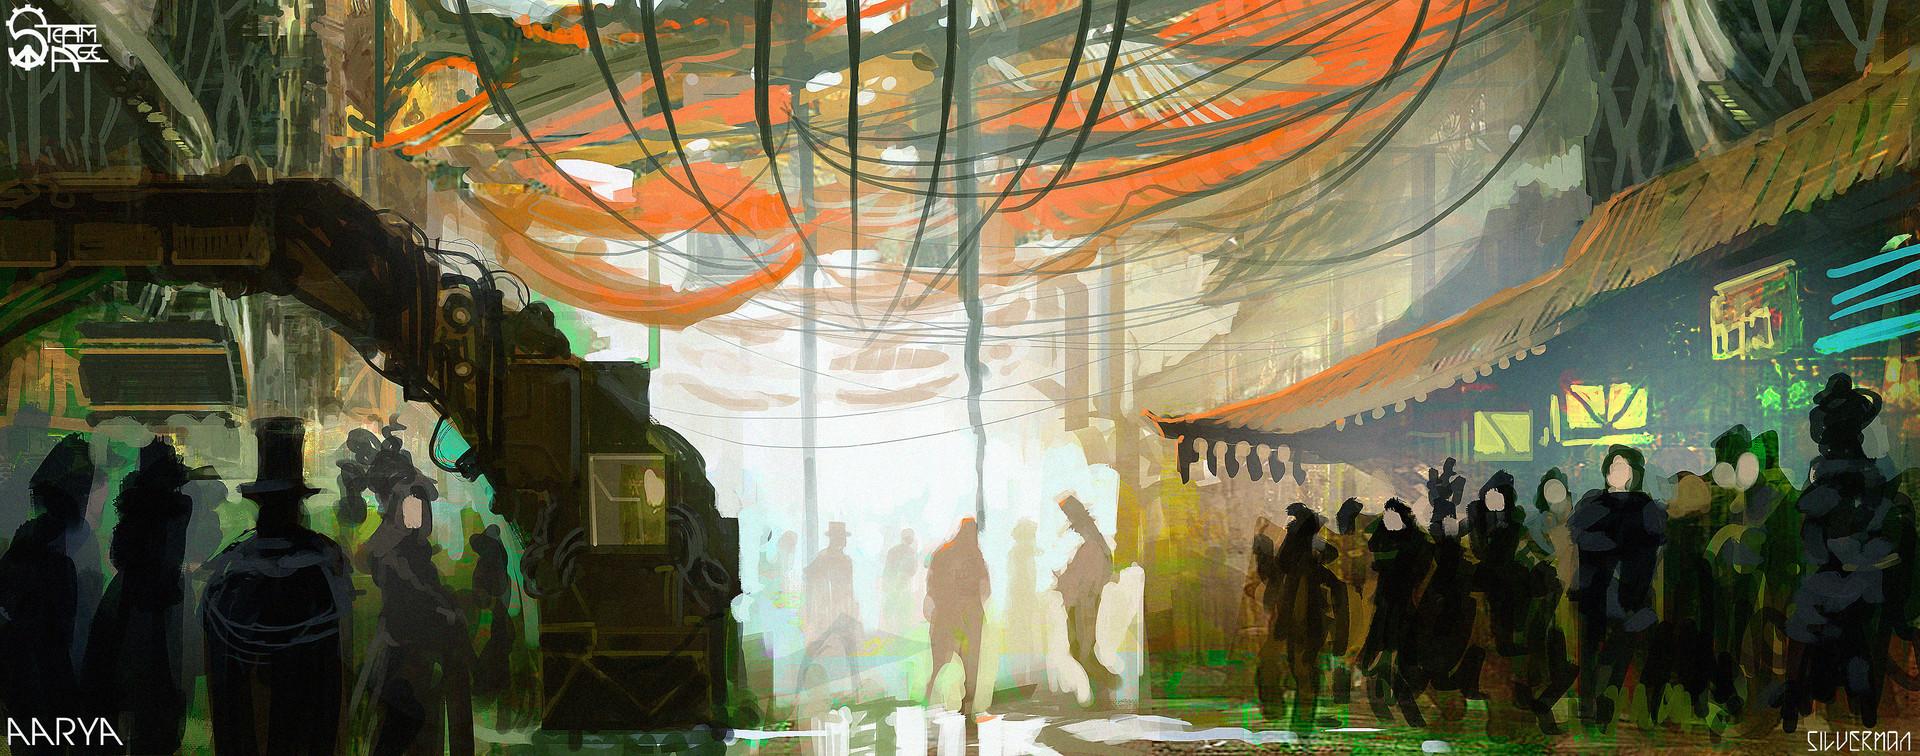 Samuel silverman aarya street concept